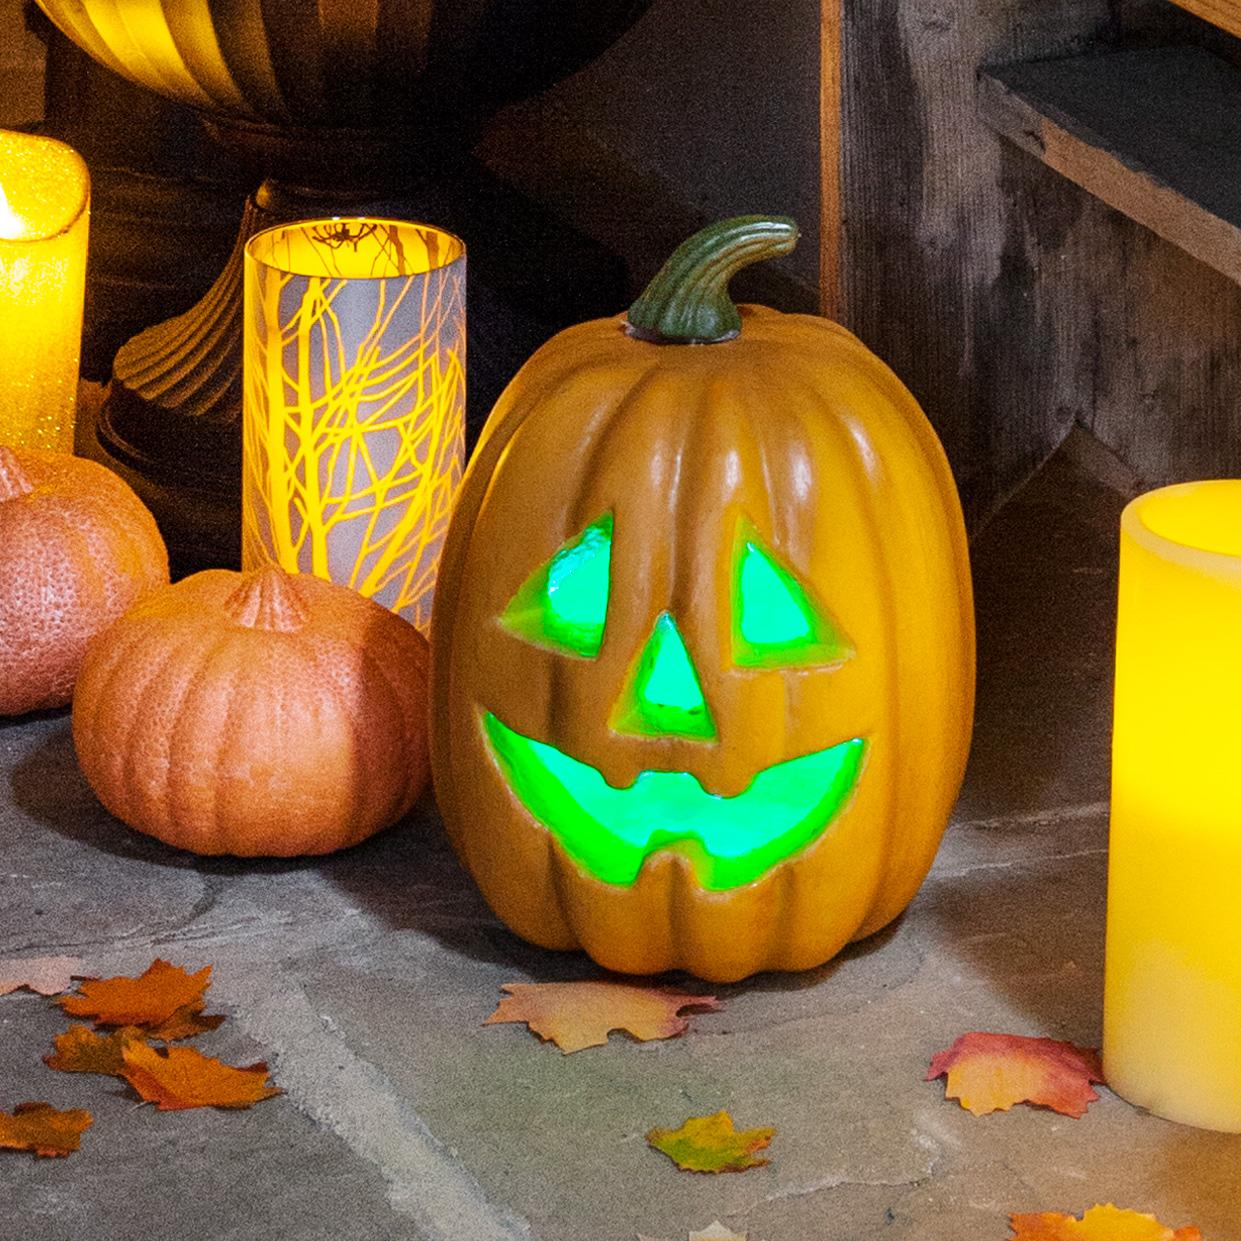 Color Cambiante LED con Pilas Calabaza de Halloween Jack-O-Lantern ...